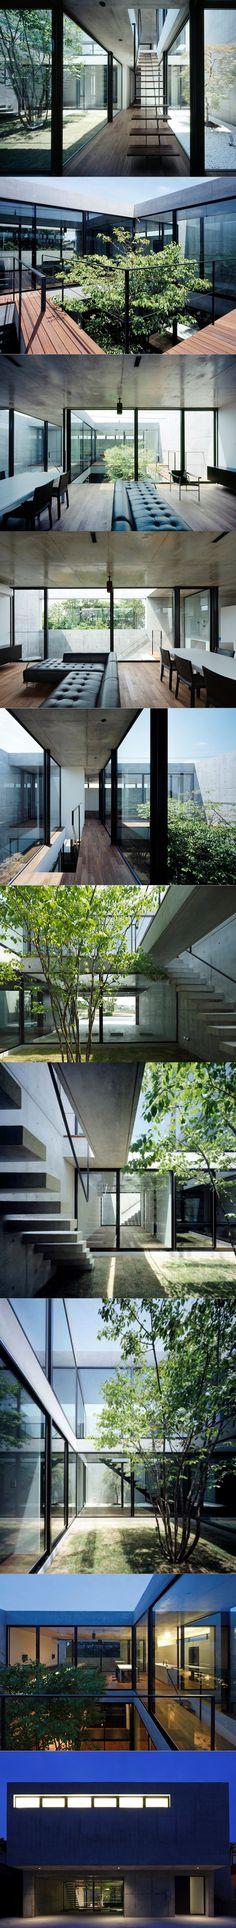 2013 Apollo - Still Courtyard House / Chiba Japan